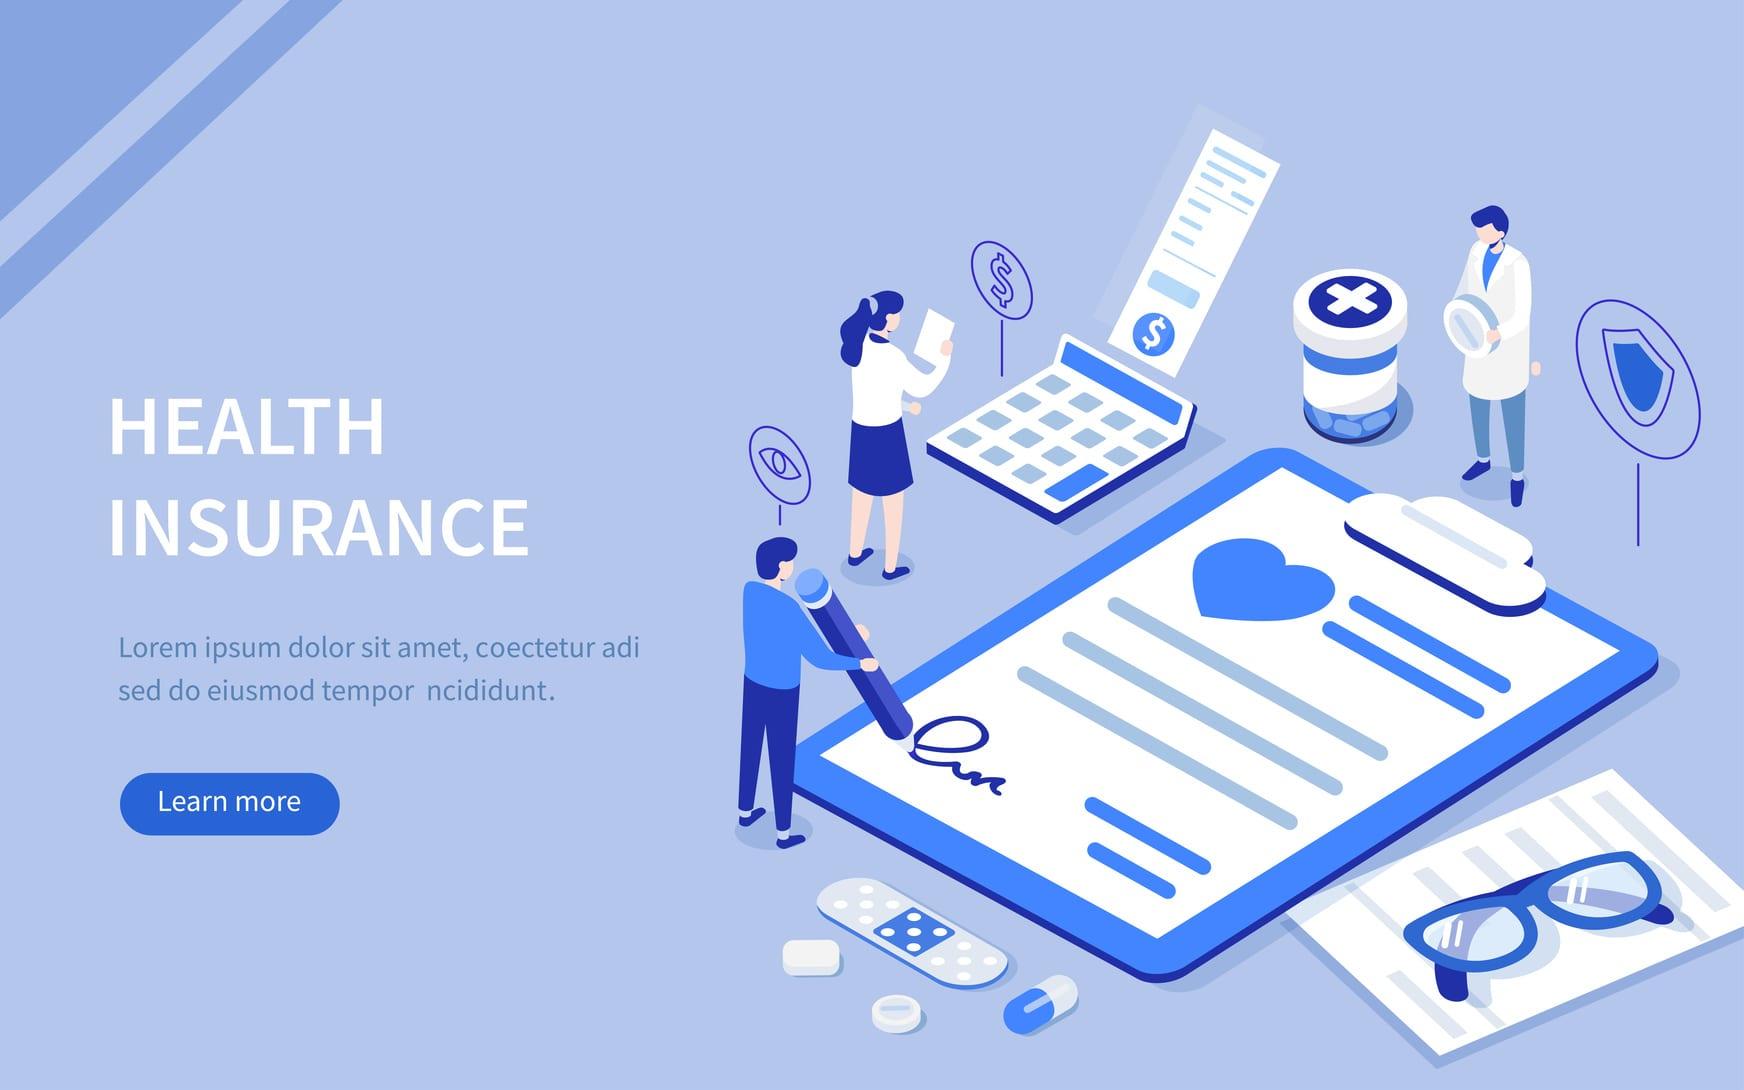 Are Health Insurance Premiums Tax Deductible? | EINSURANCE